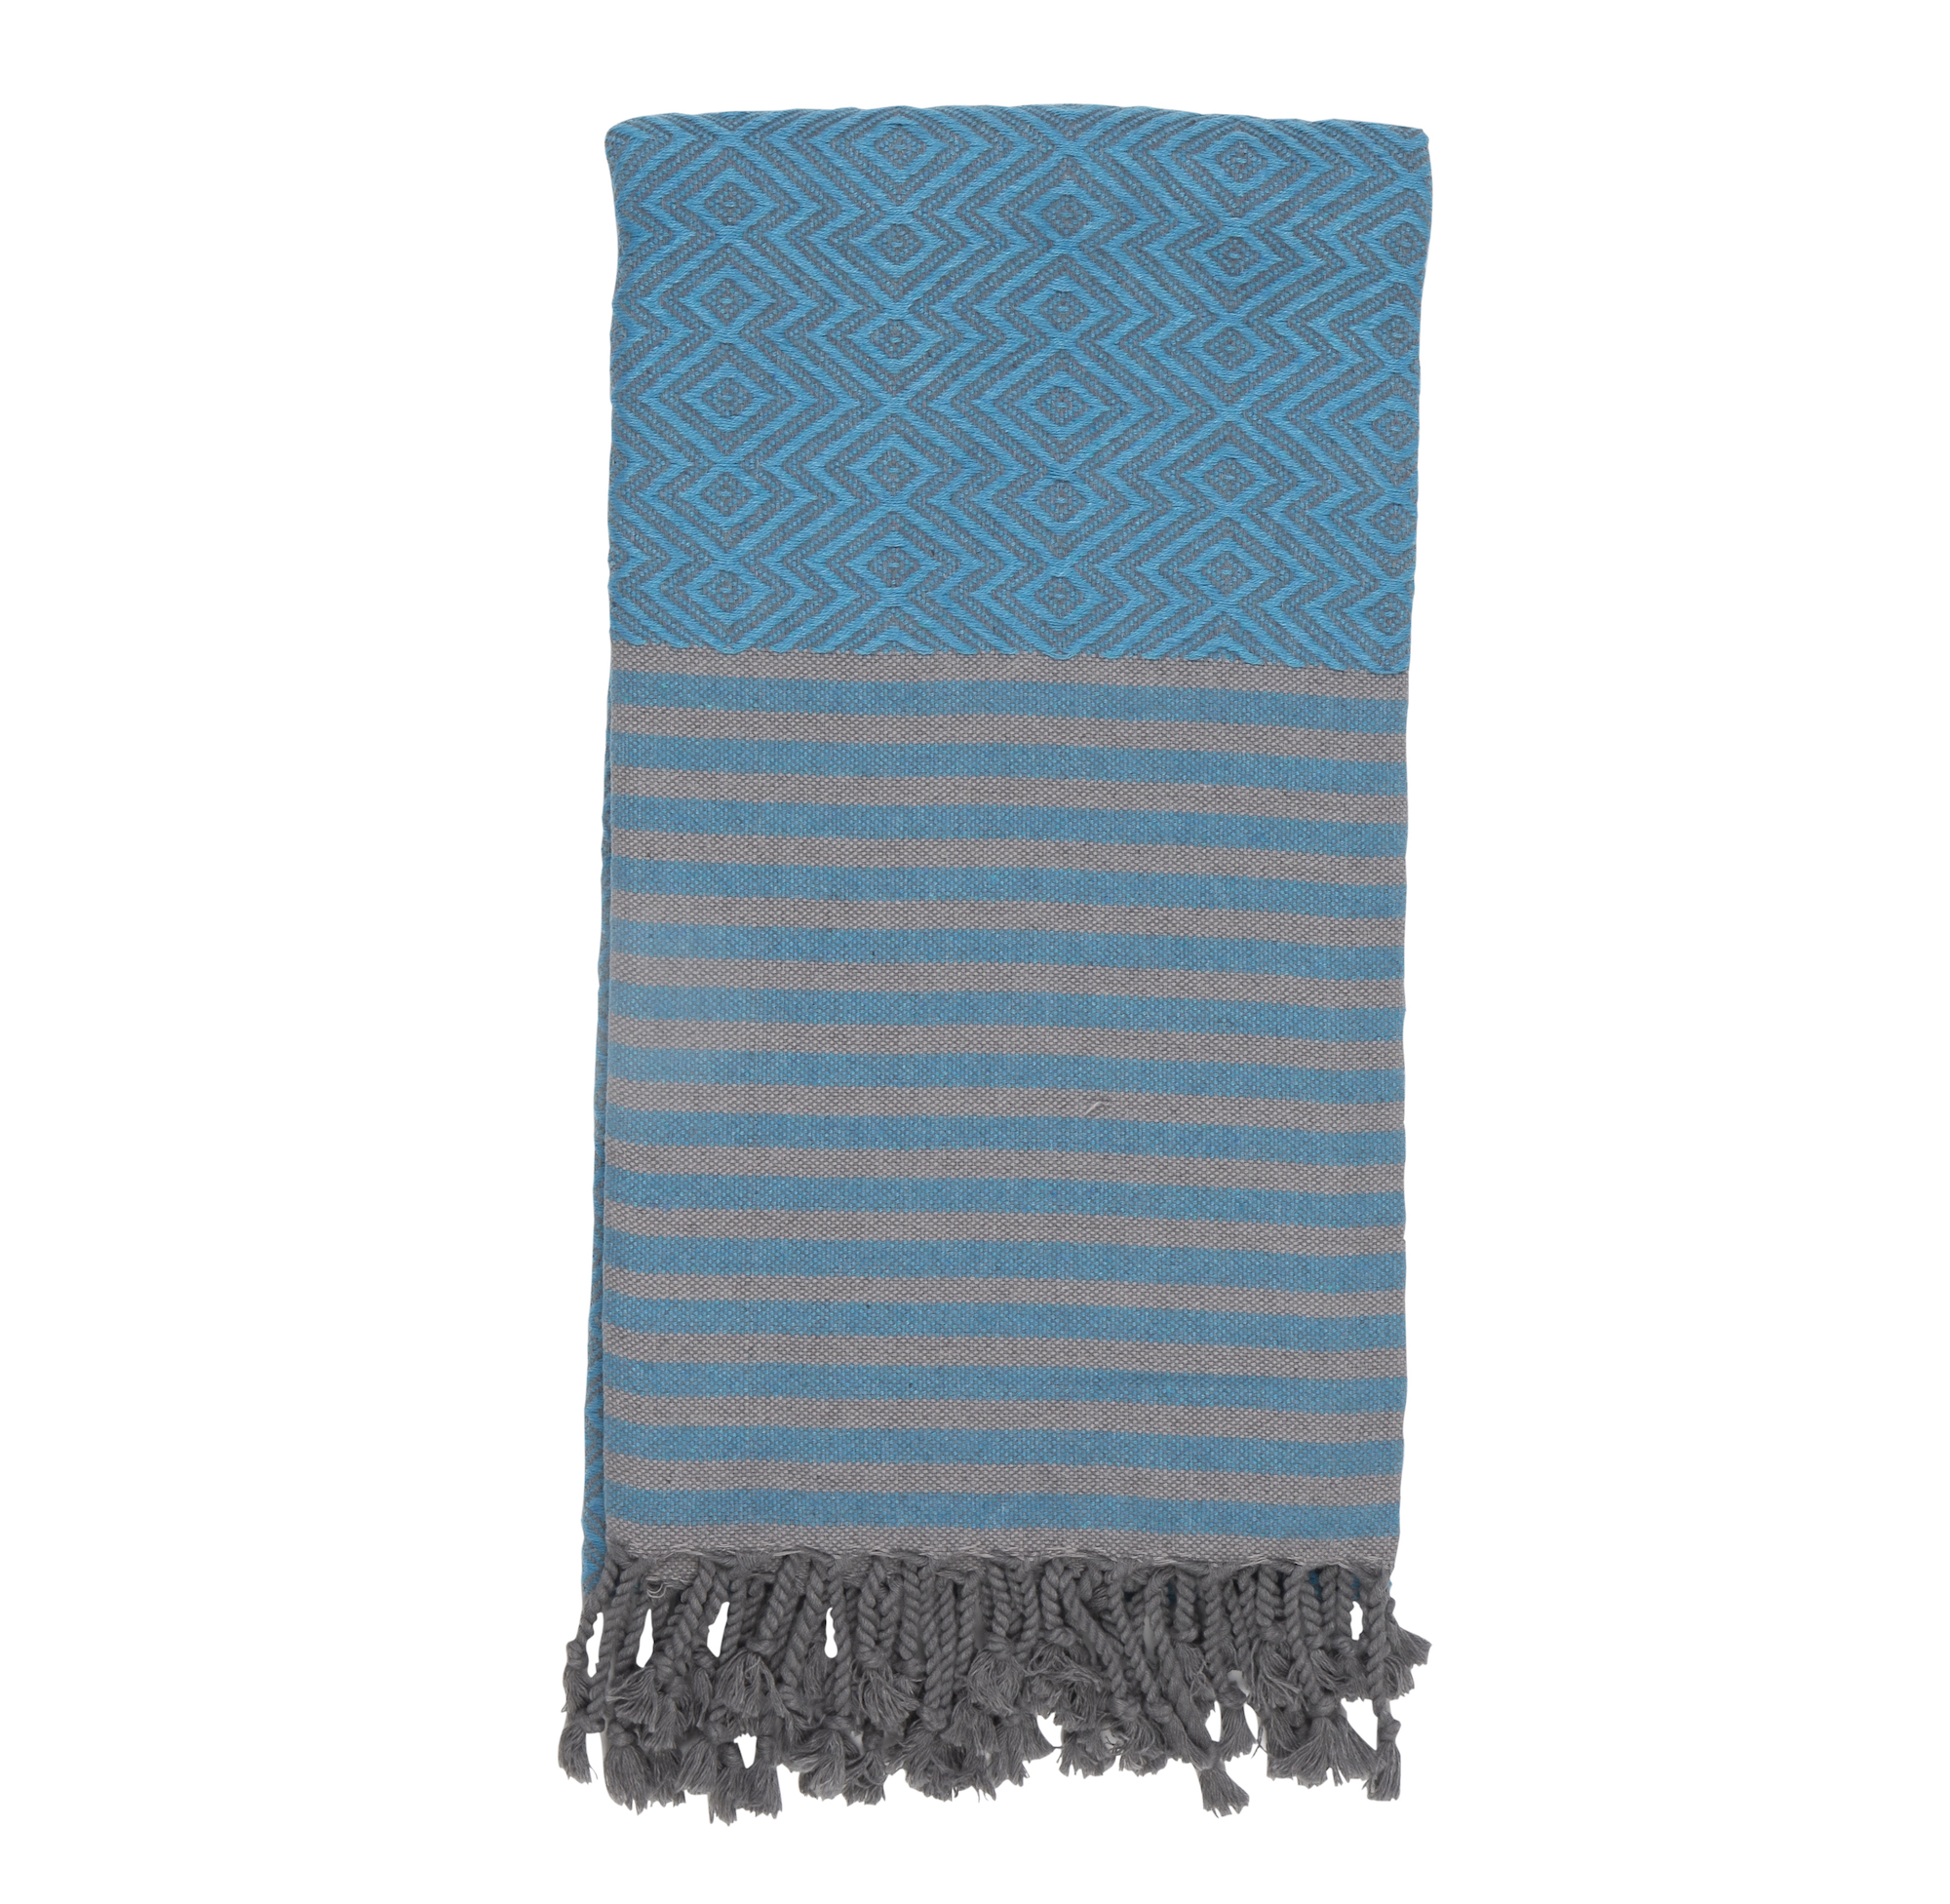 Hammam Towel in Turquoise Blue & Grey